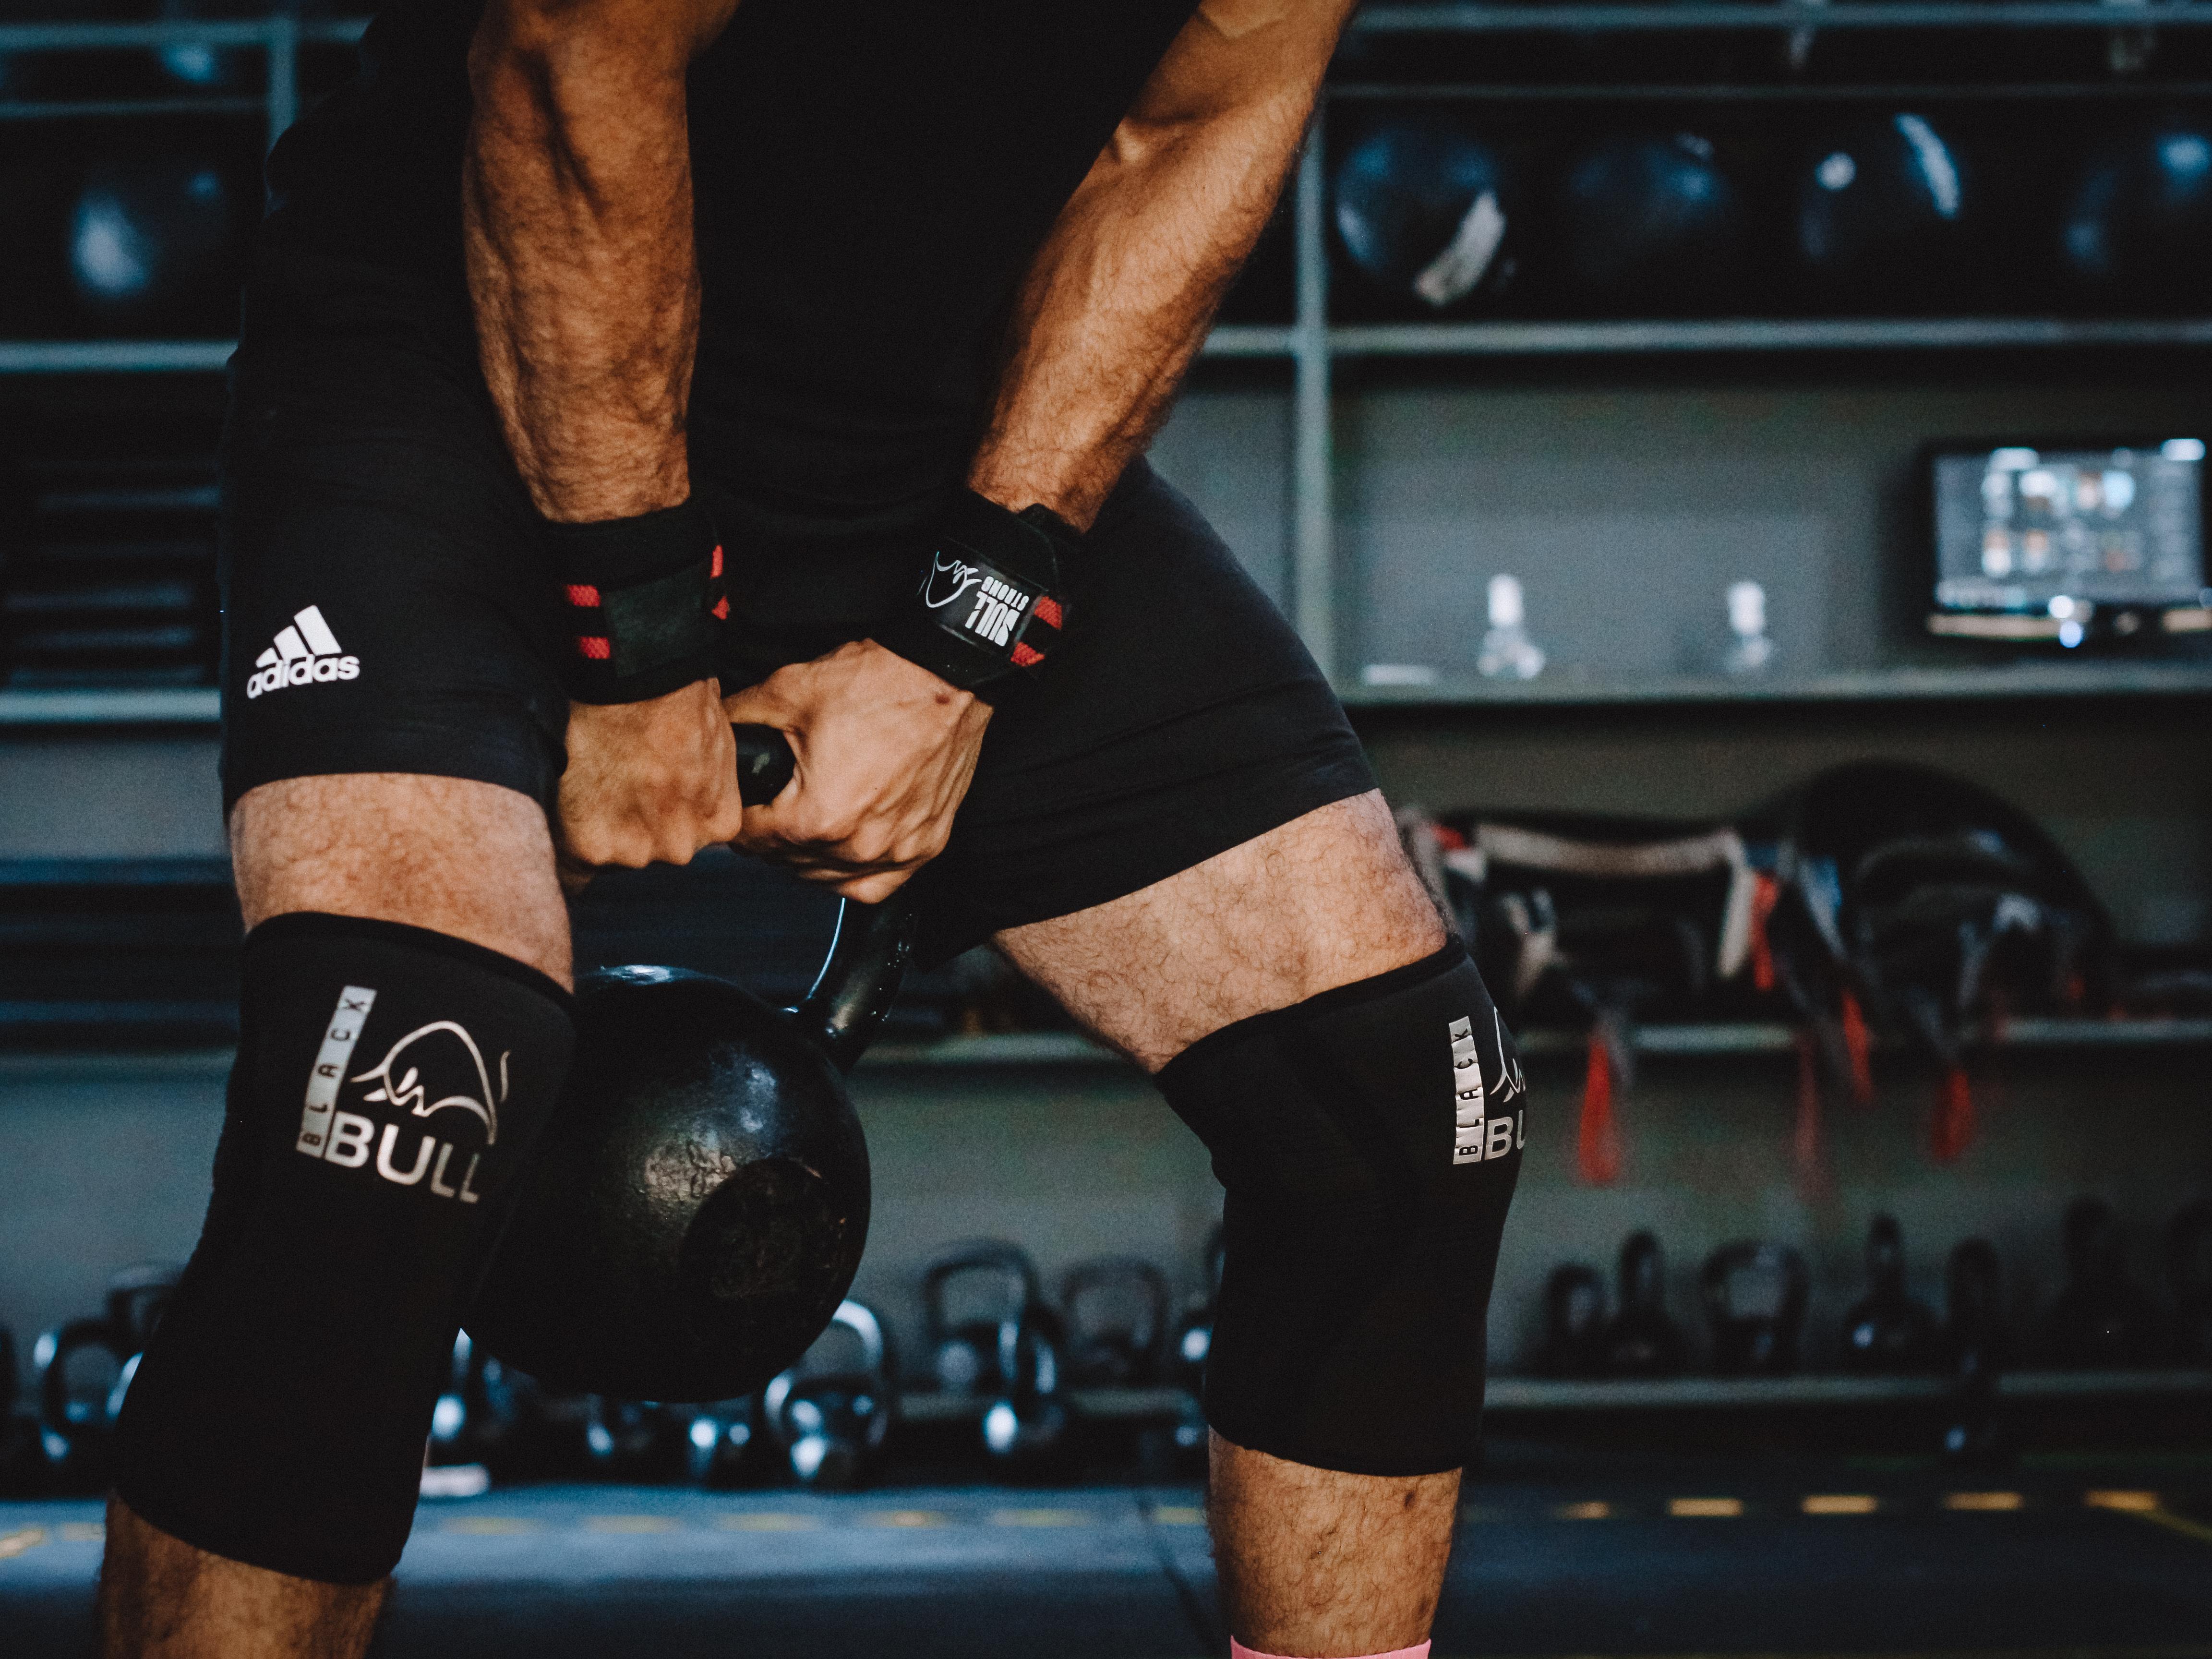 man people strength fitness